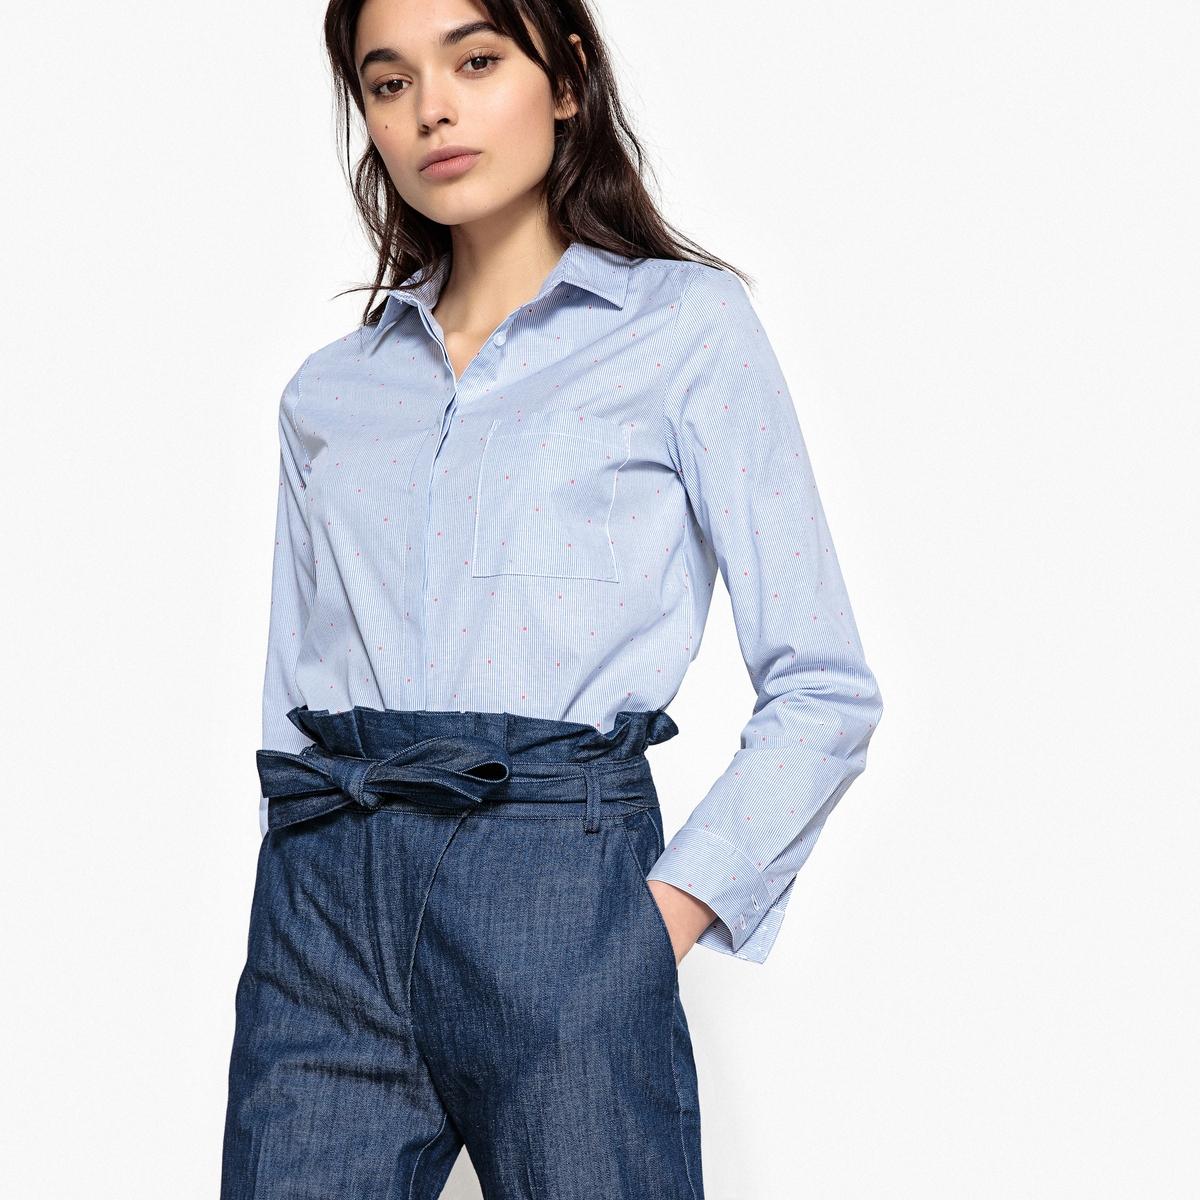 Camisa cintada, mangas compridas